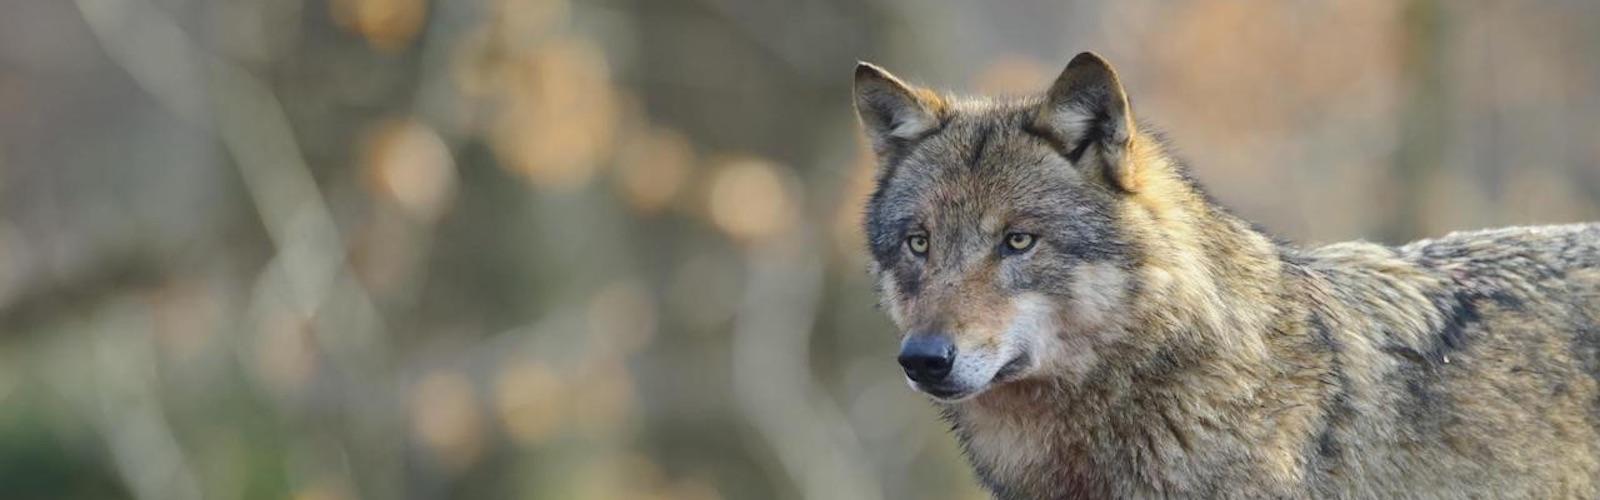 Wolf-Bundesnaturschutzgesetz